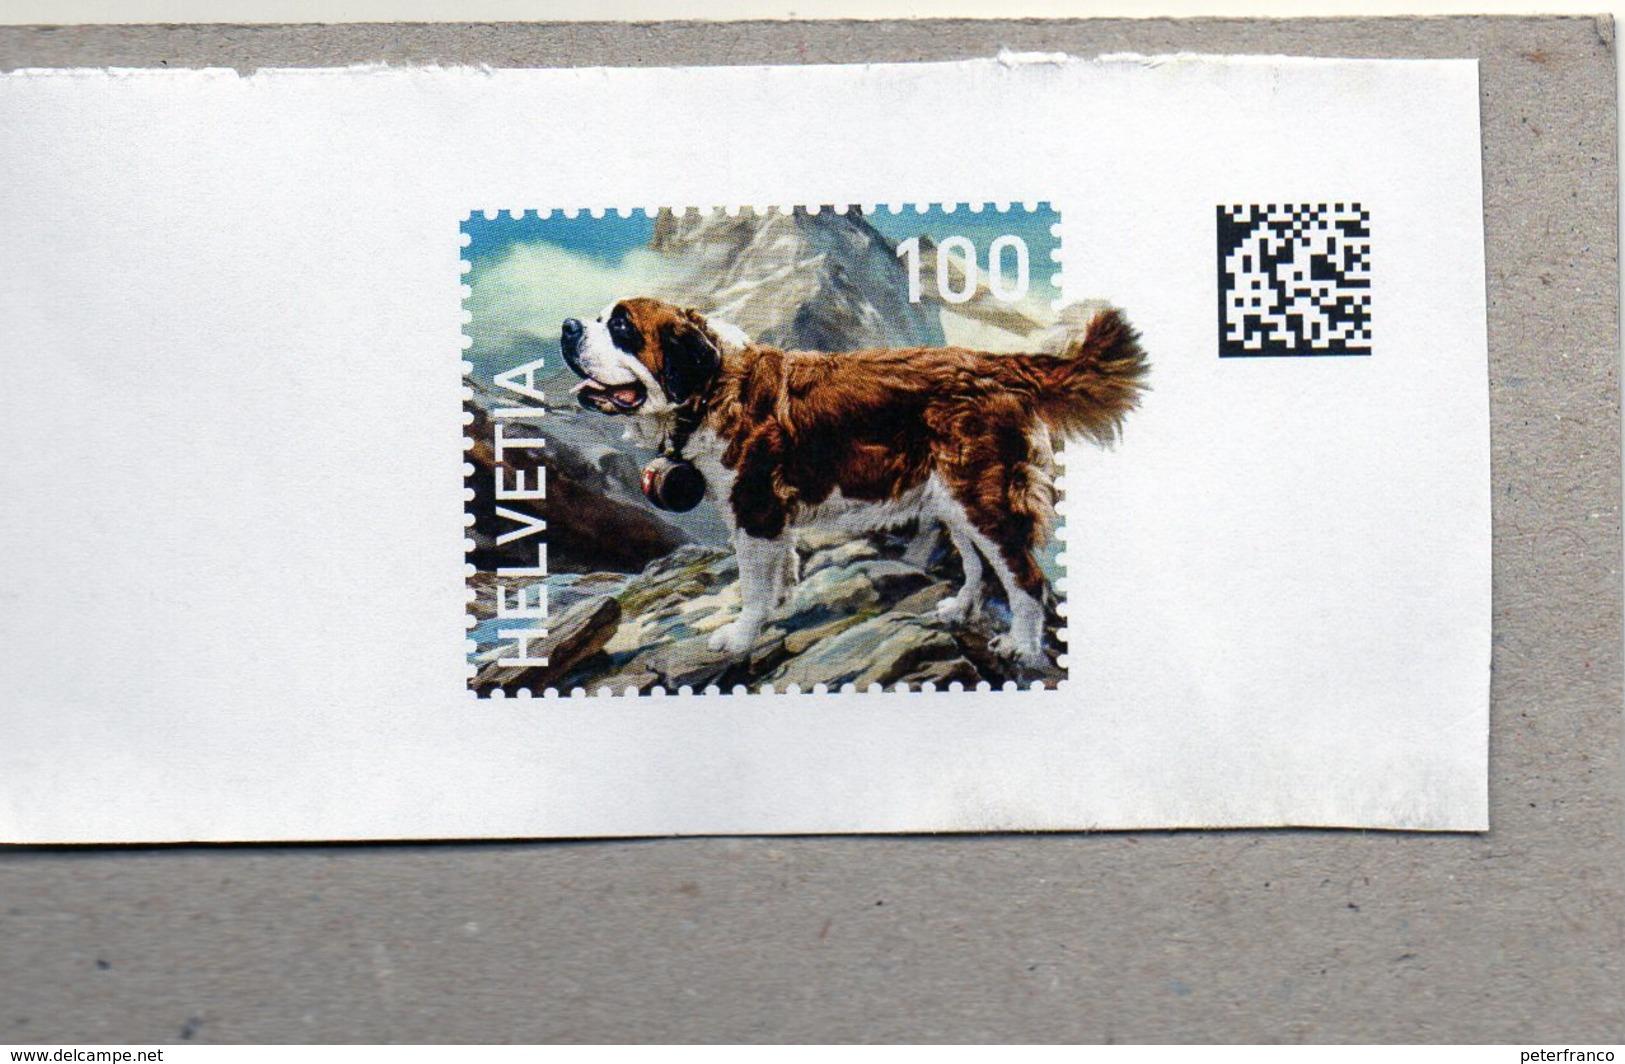 Svizzera - Webstamp - Cane San Bernardo (frammento) - Suiza